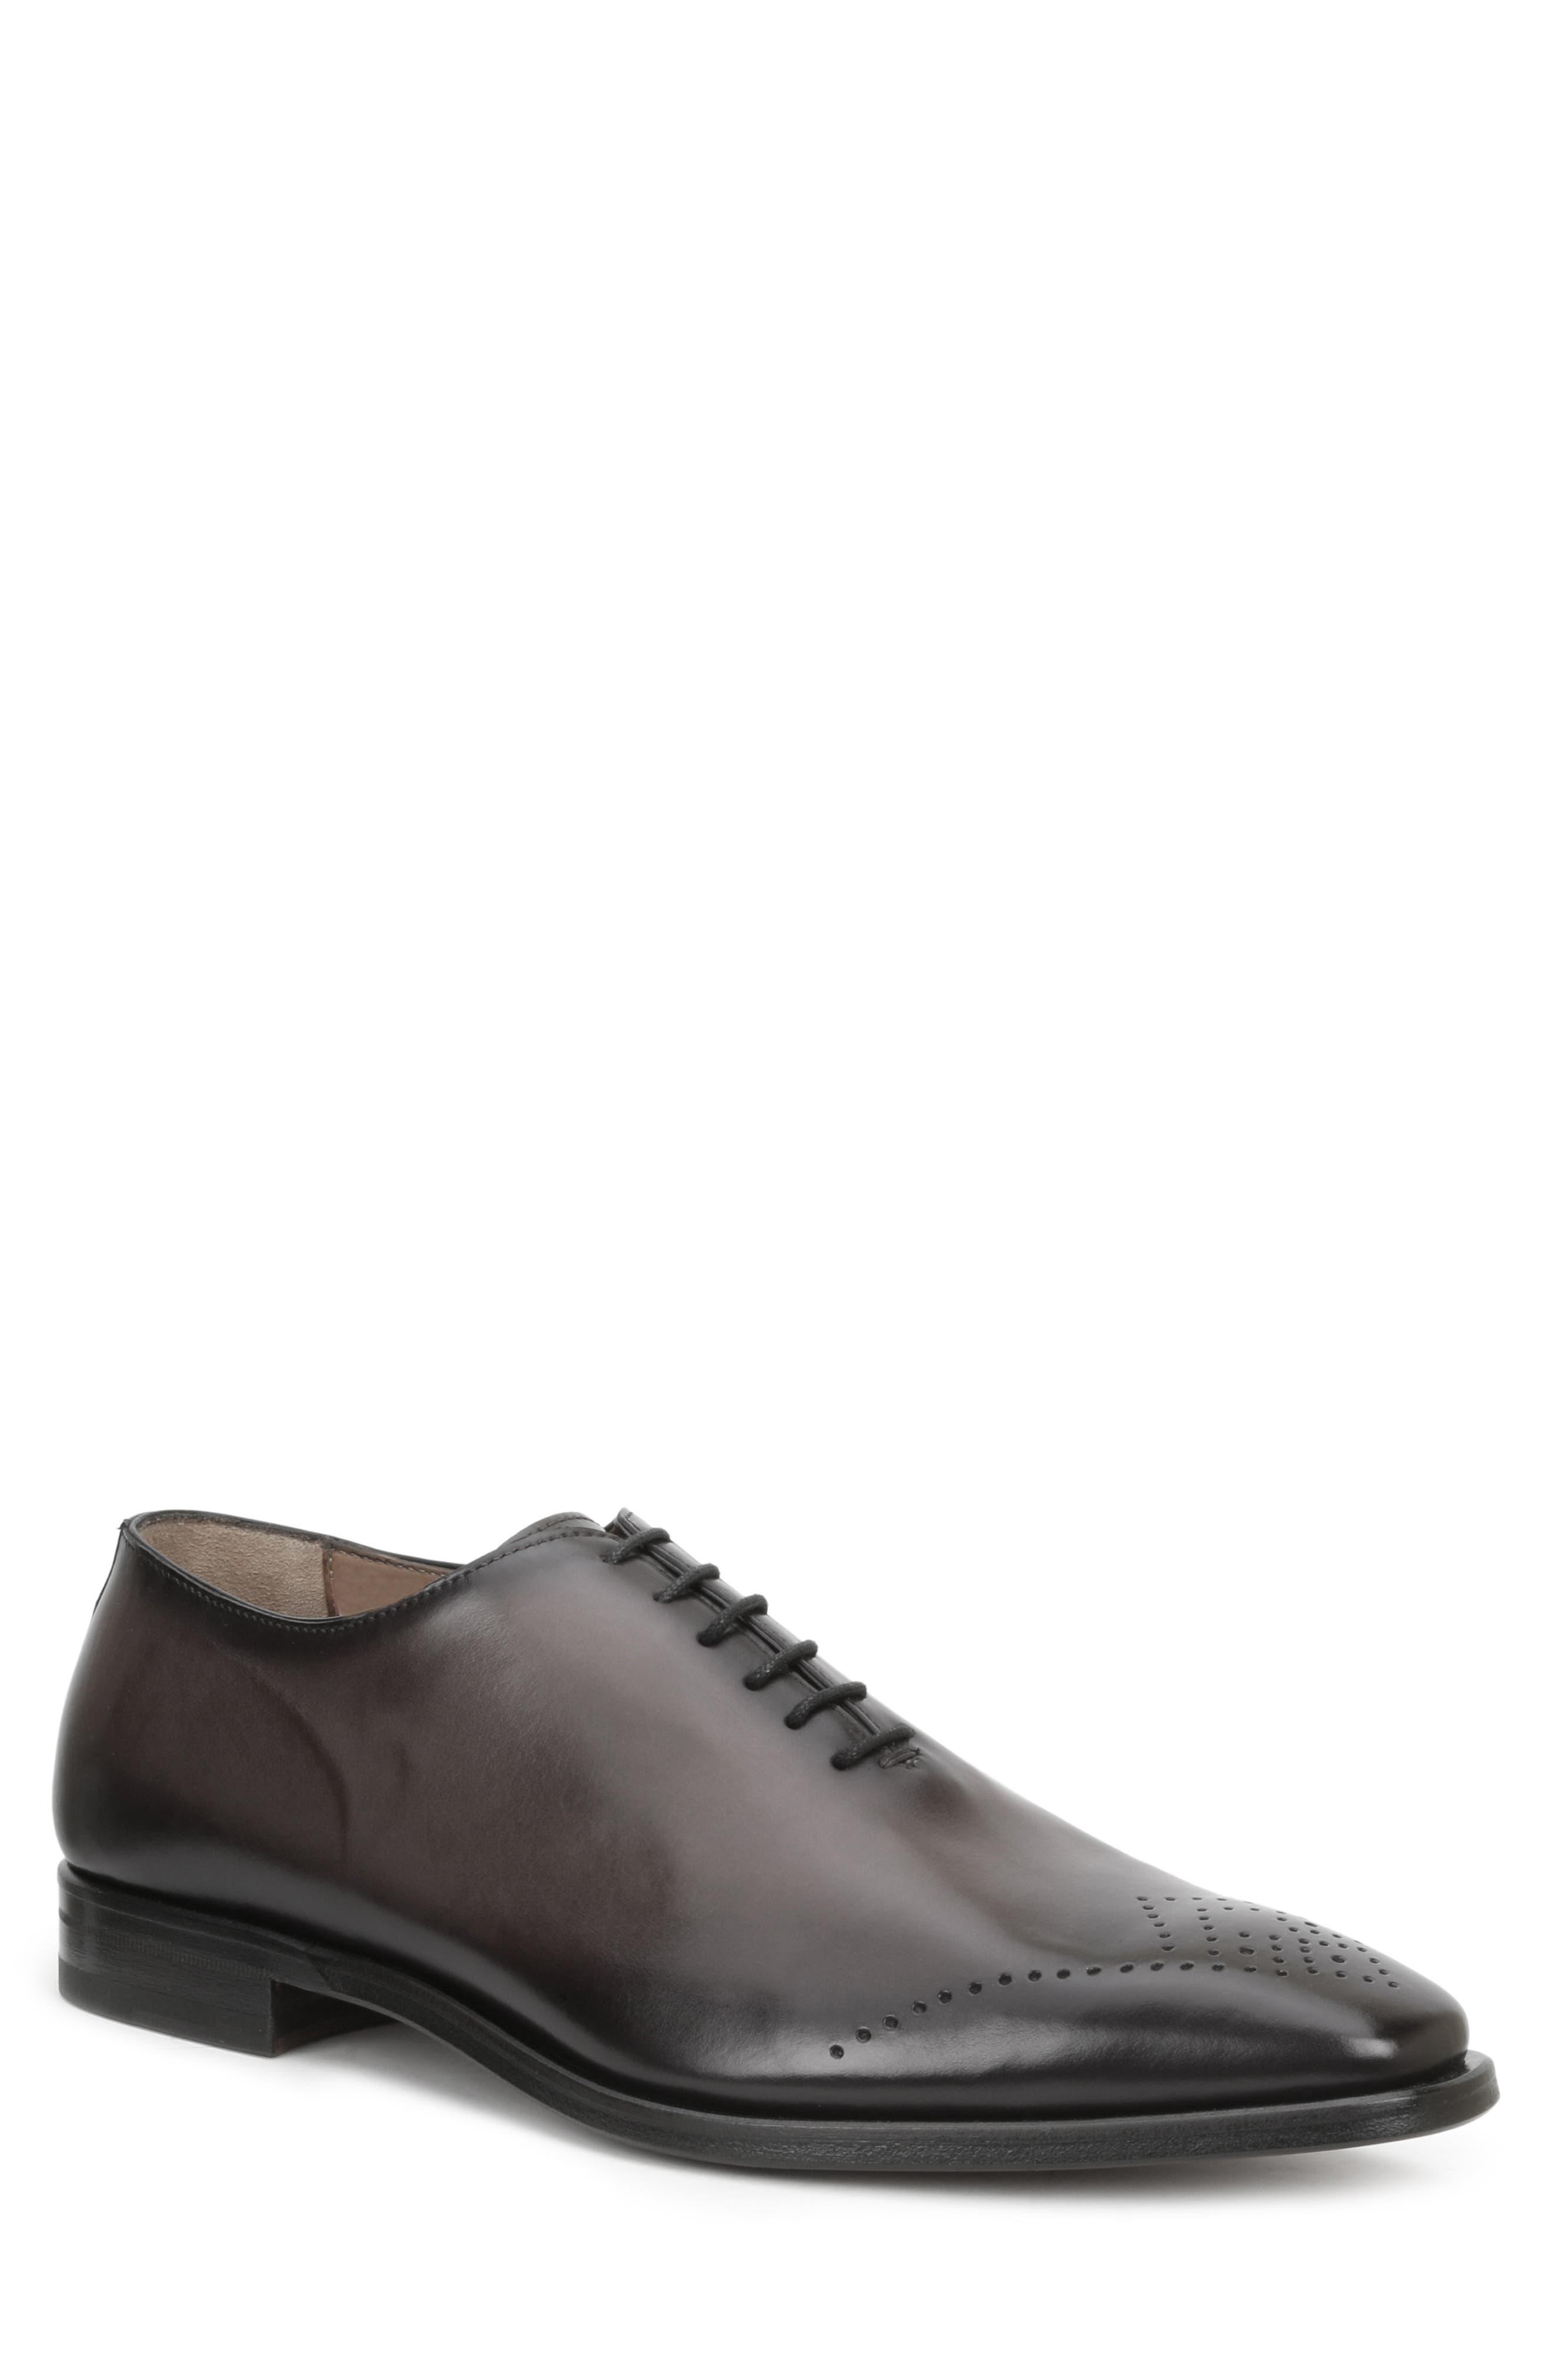 Claudio Medallion Toe Leather Oxfords in Dark Grey